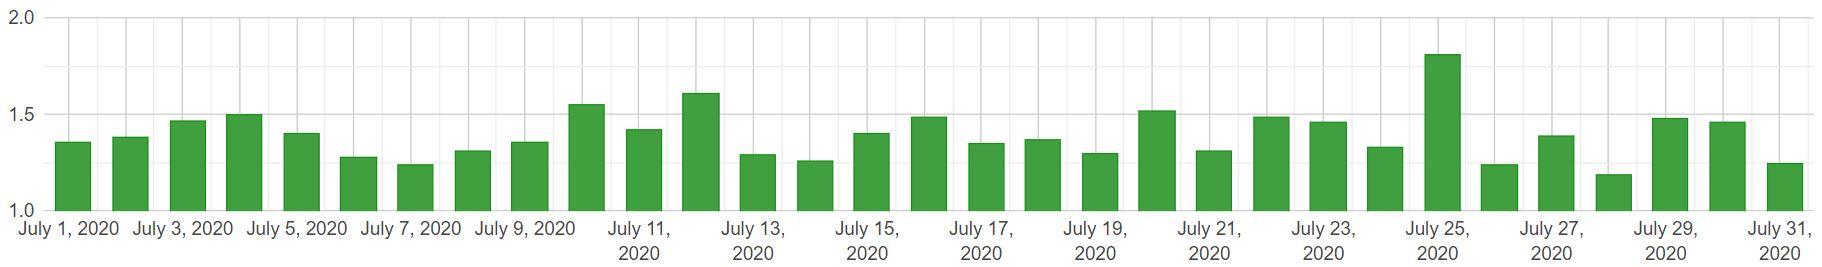 SERP changes mobile lipiec 2020